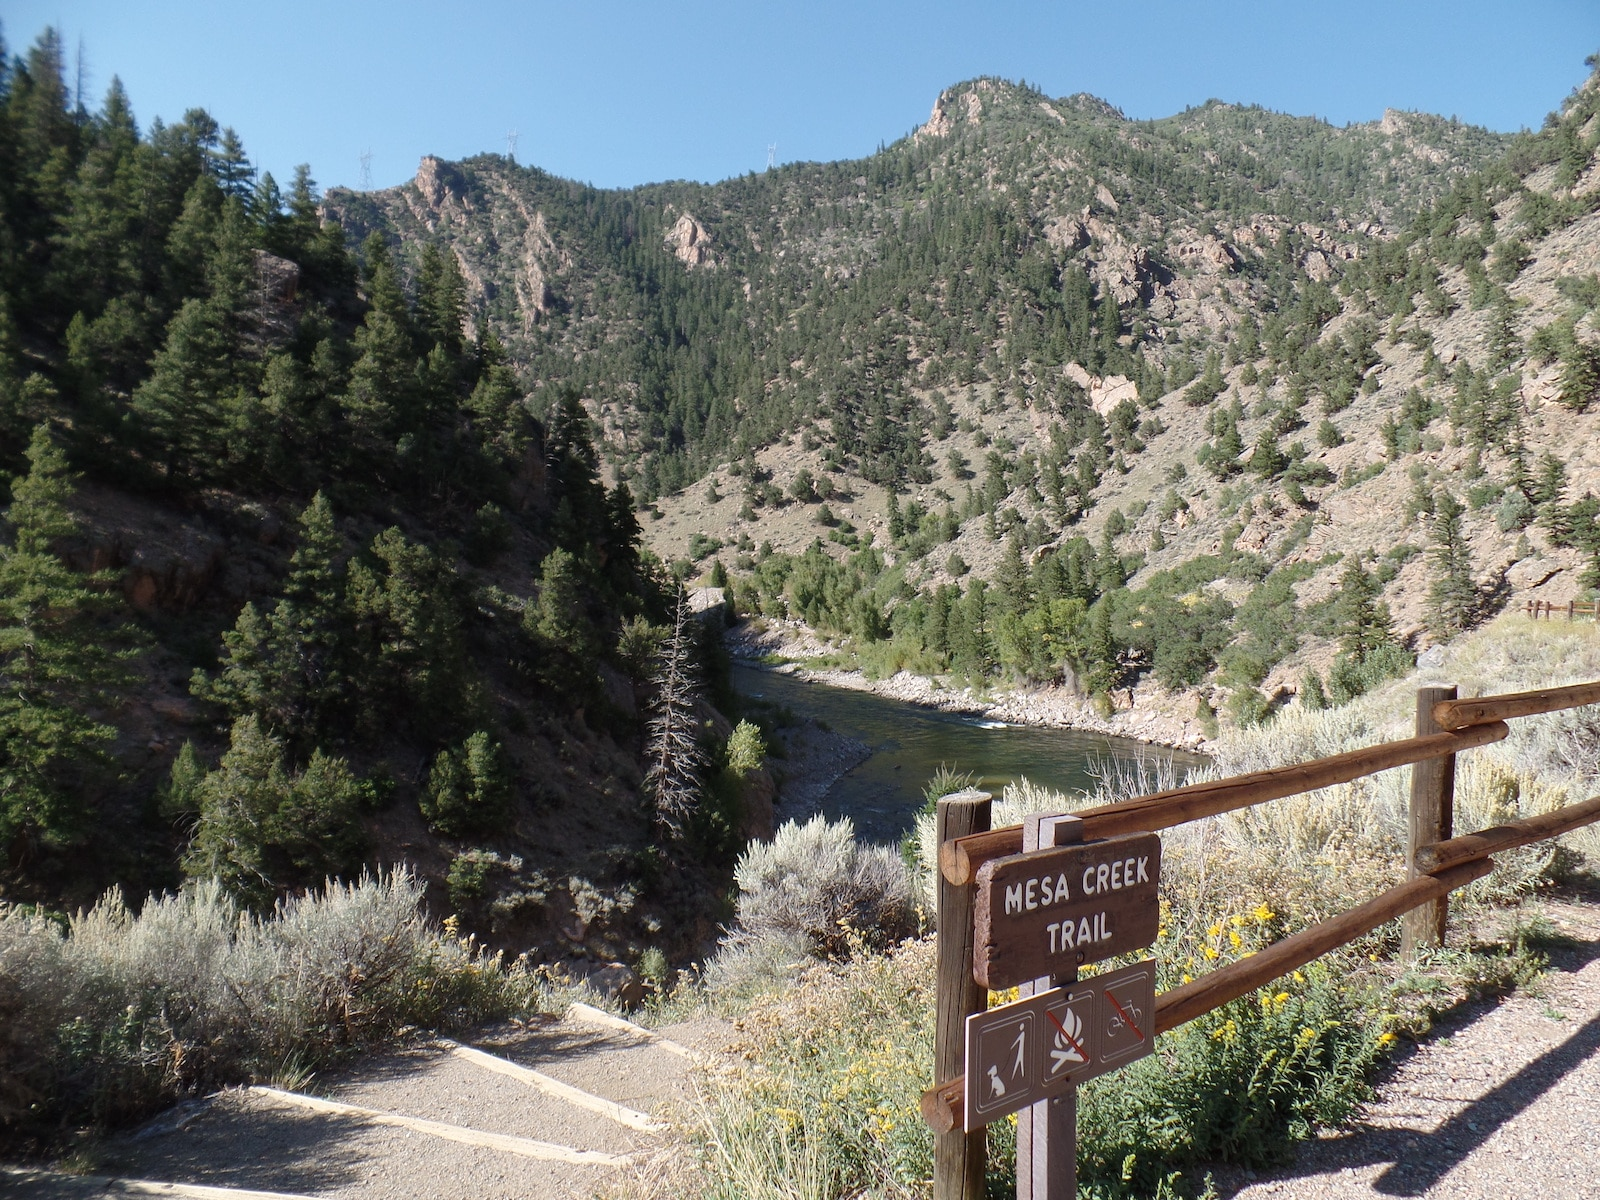 Mesa Trail at Curecanti National Recreation Area